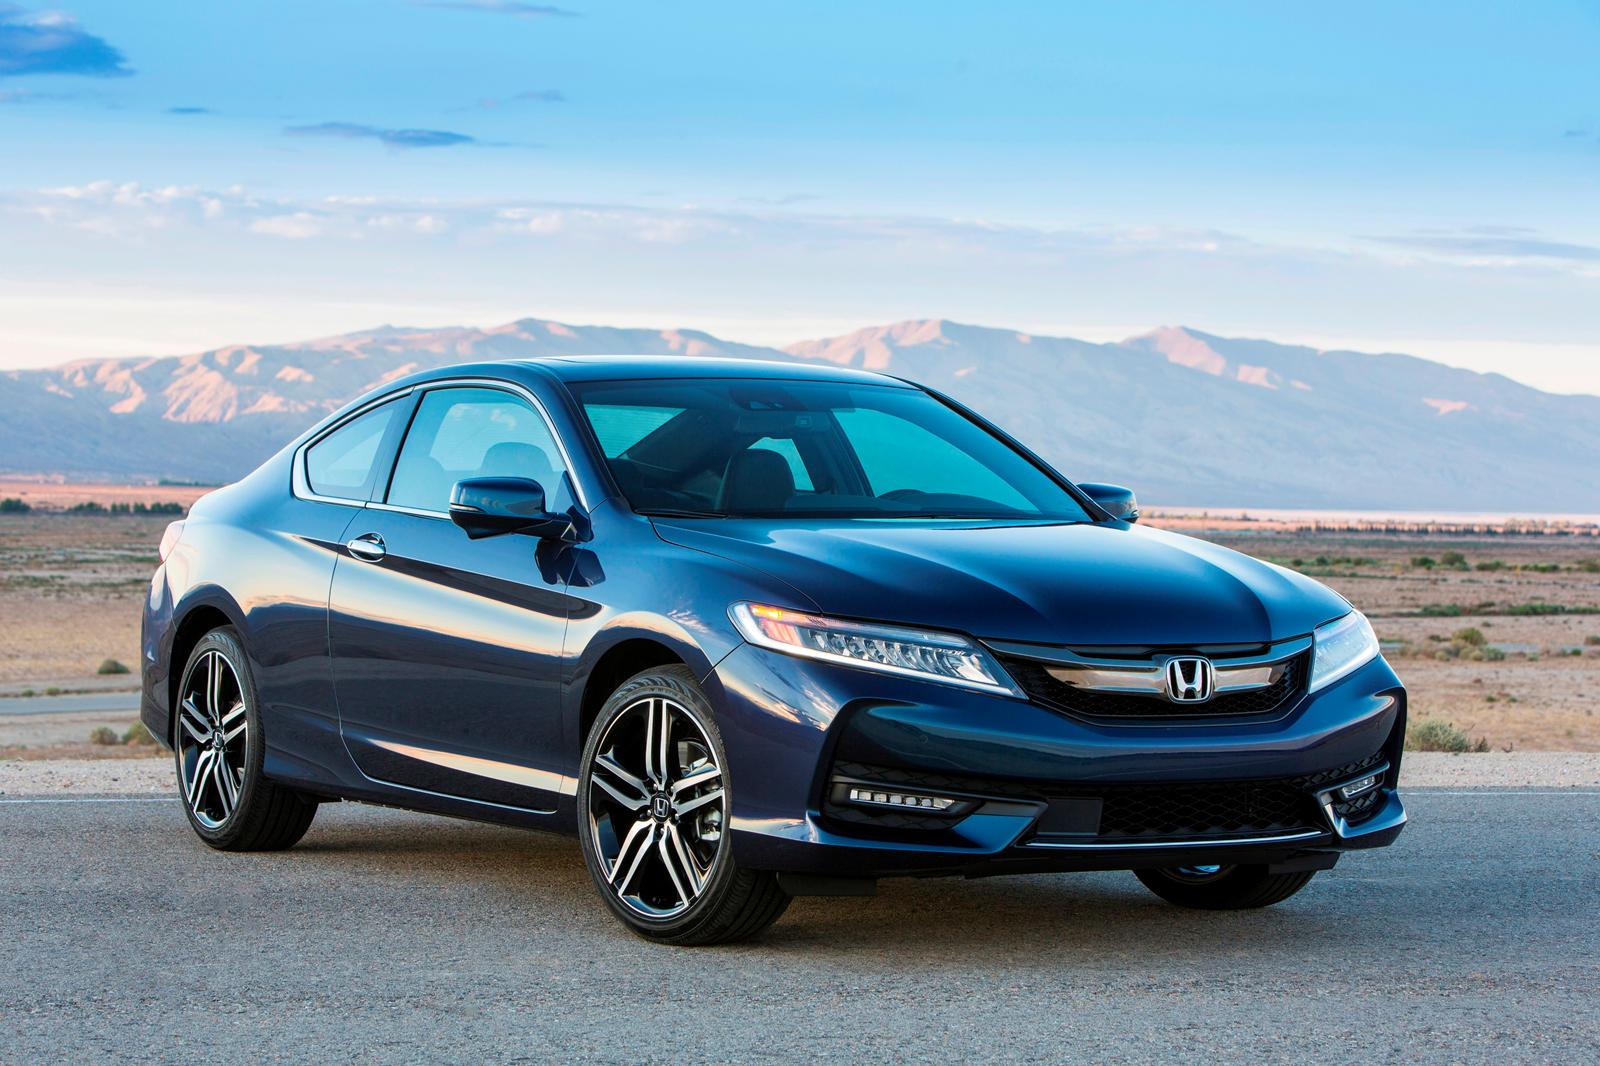 2016 honda accord coupe  review  trims  specs  price  new interior features  exterior design